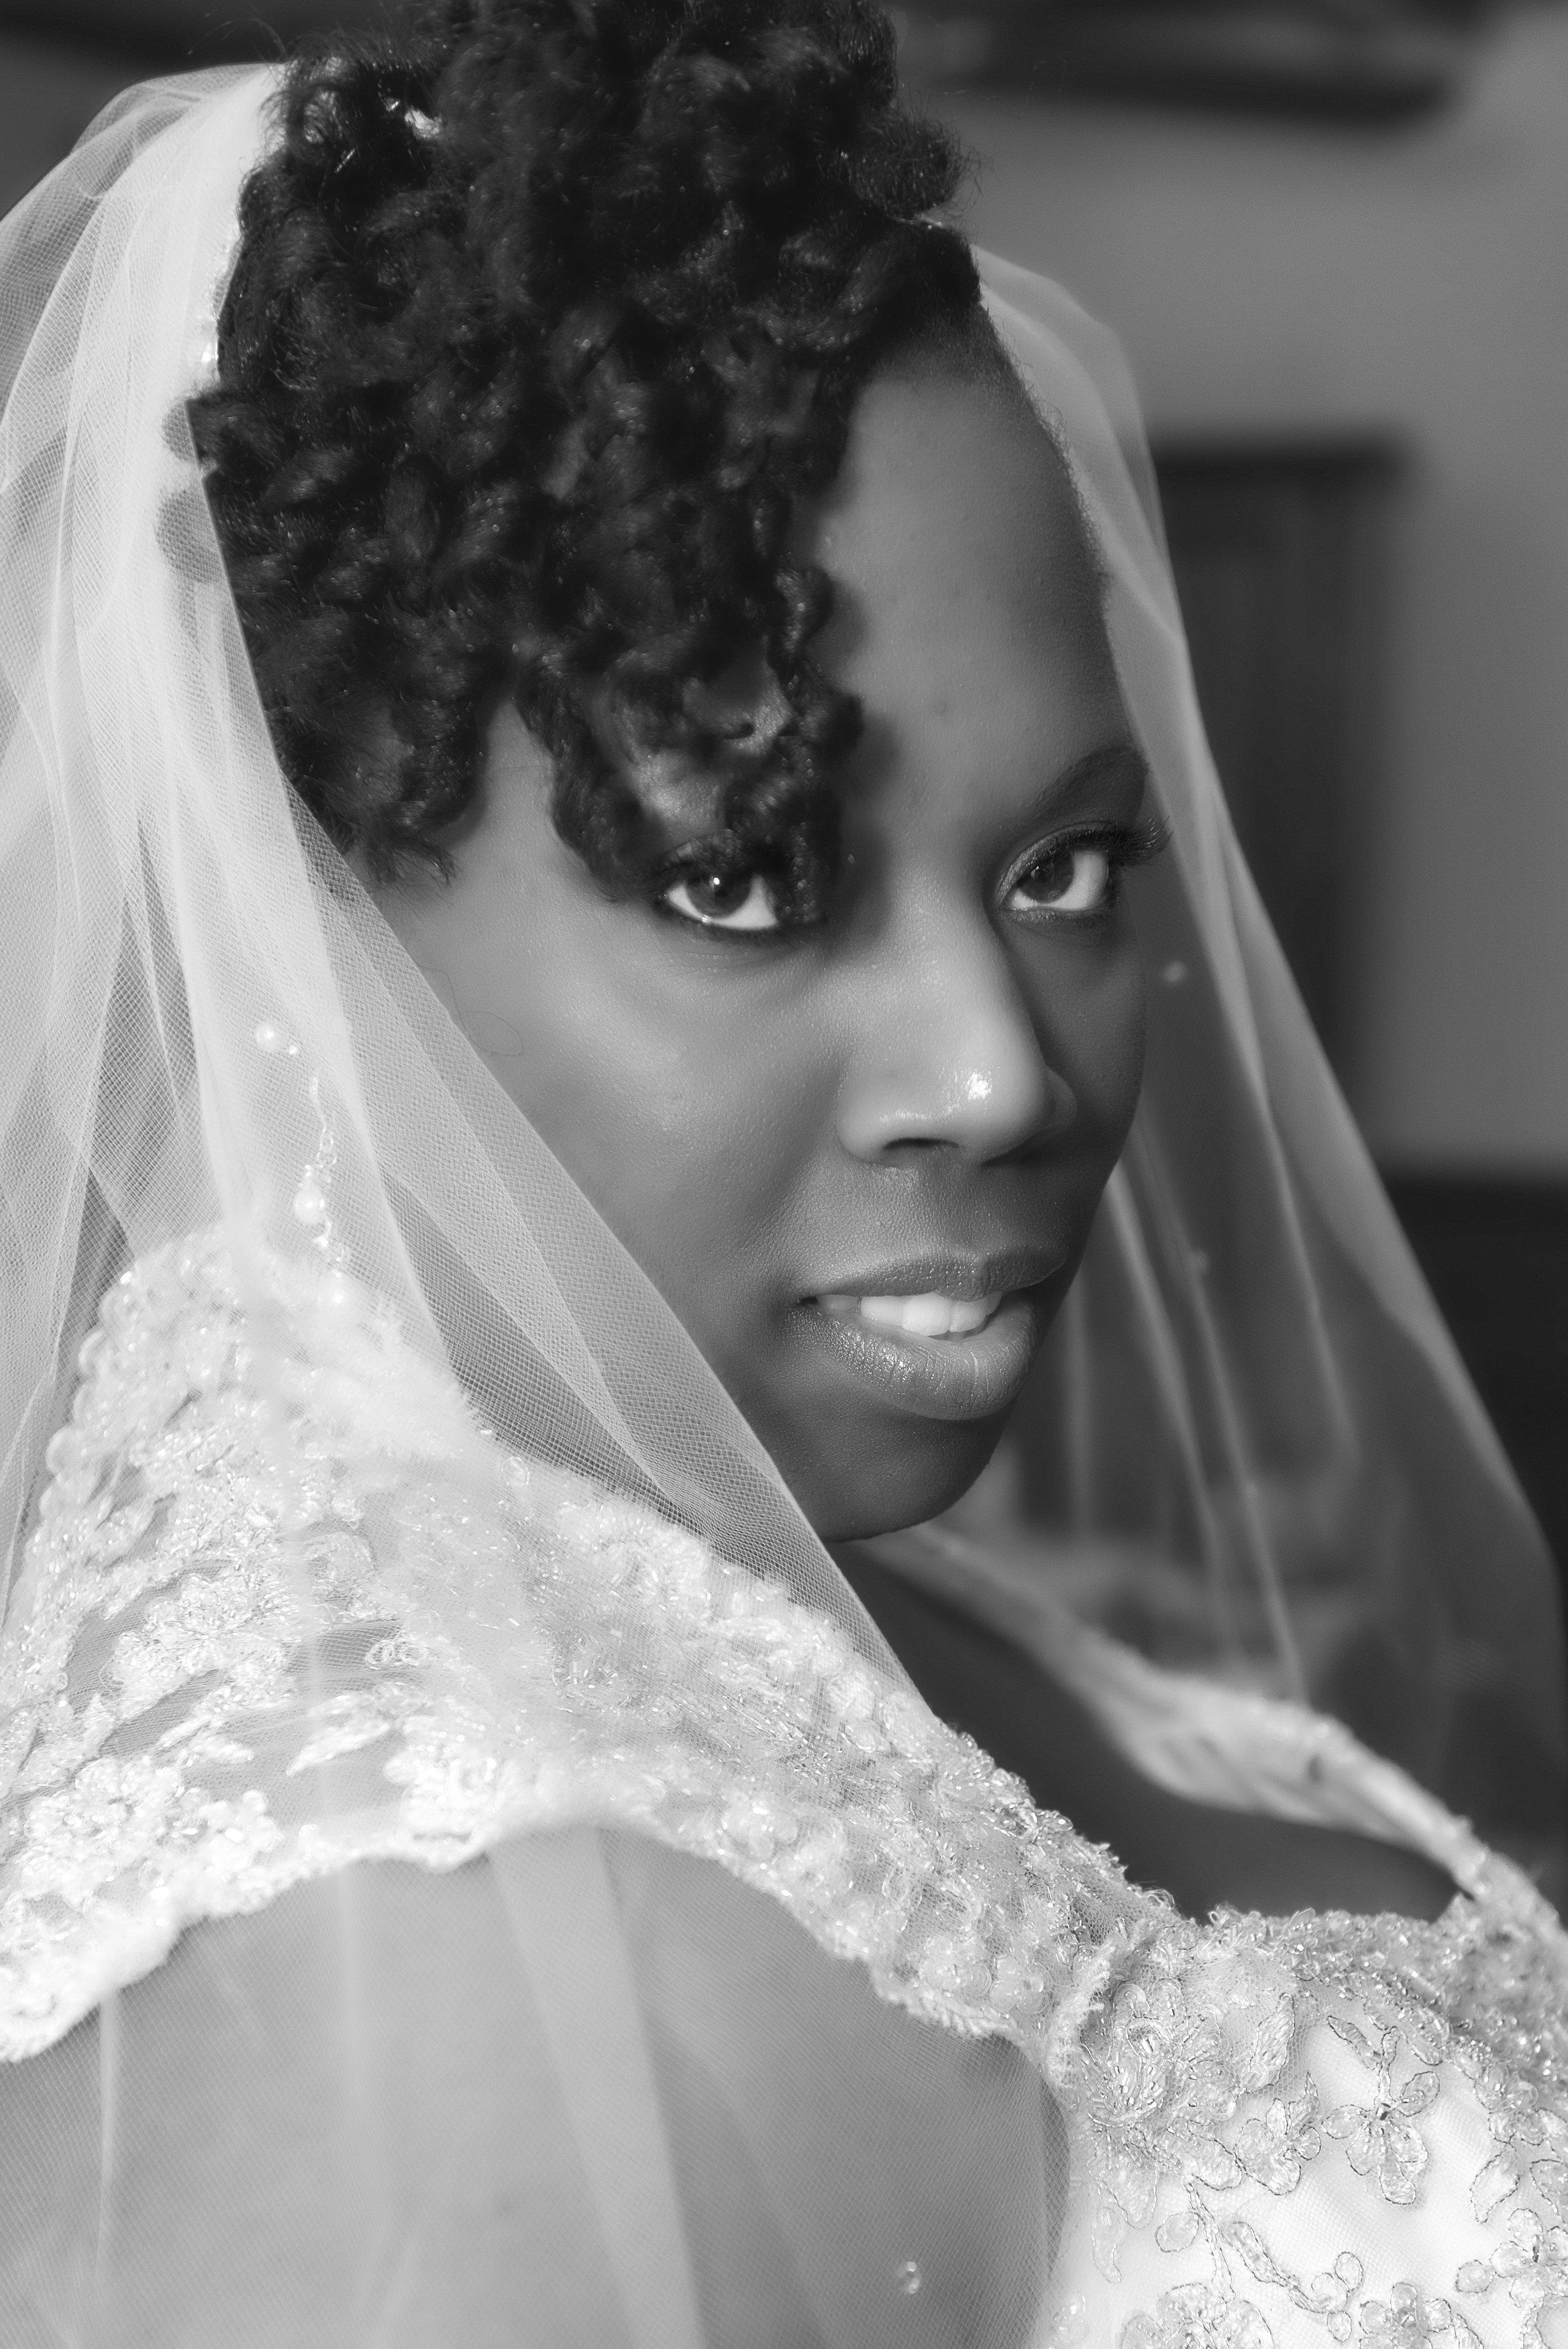 plus size brides, curvy brides, bridal magazine